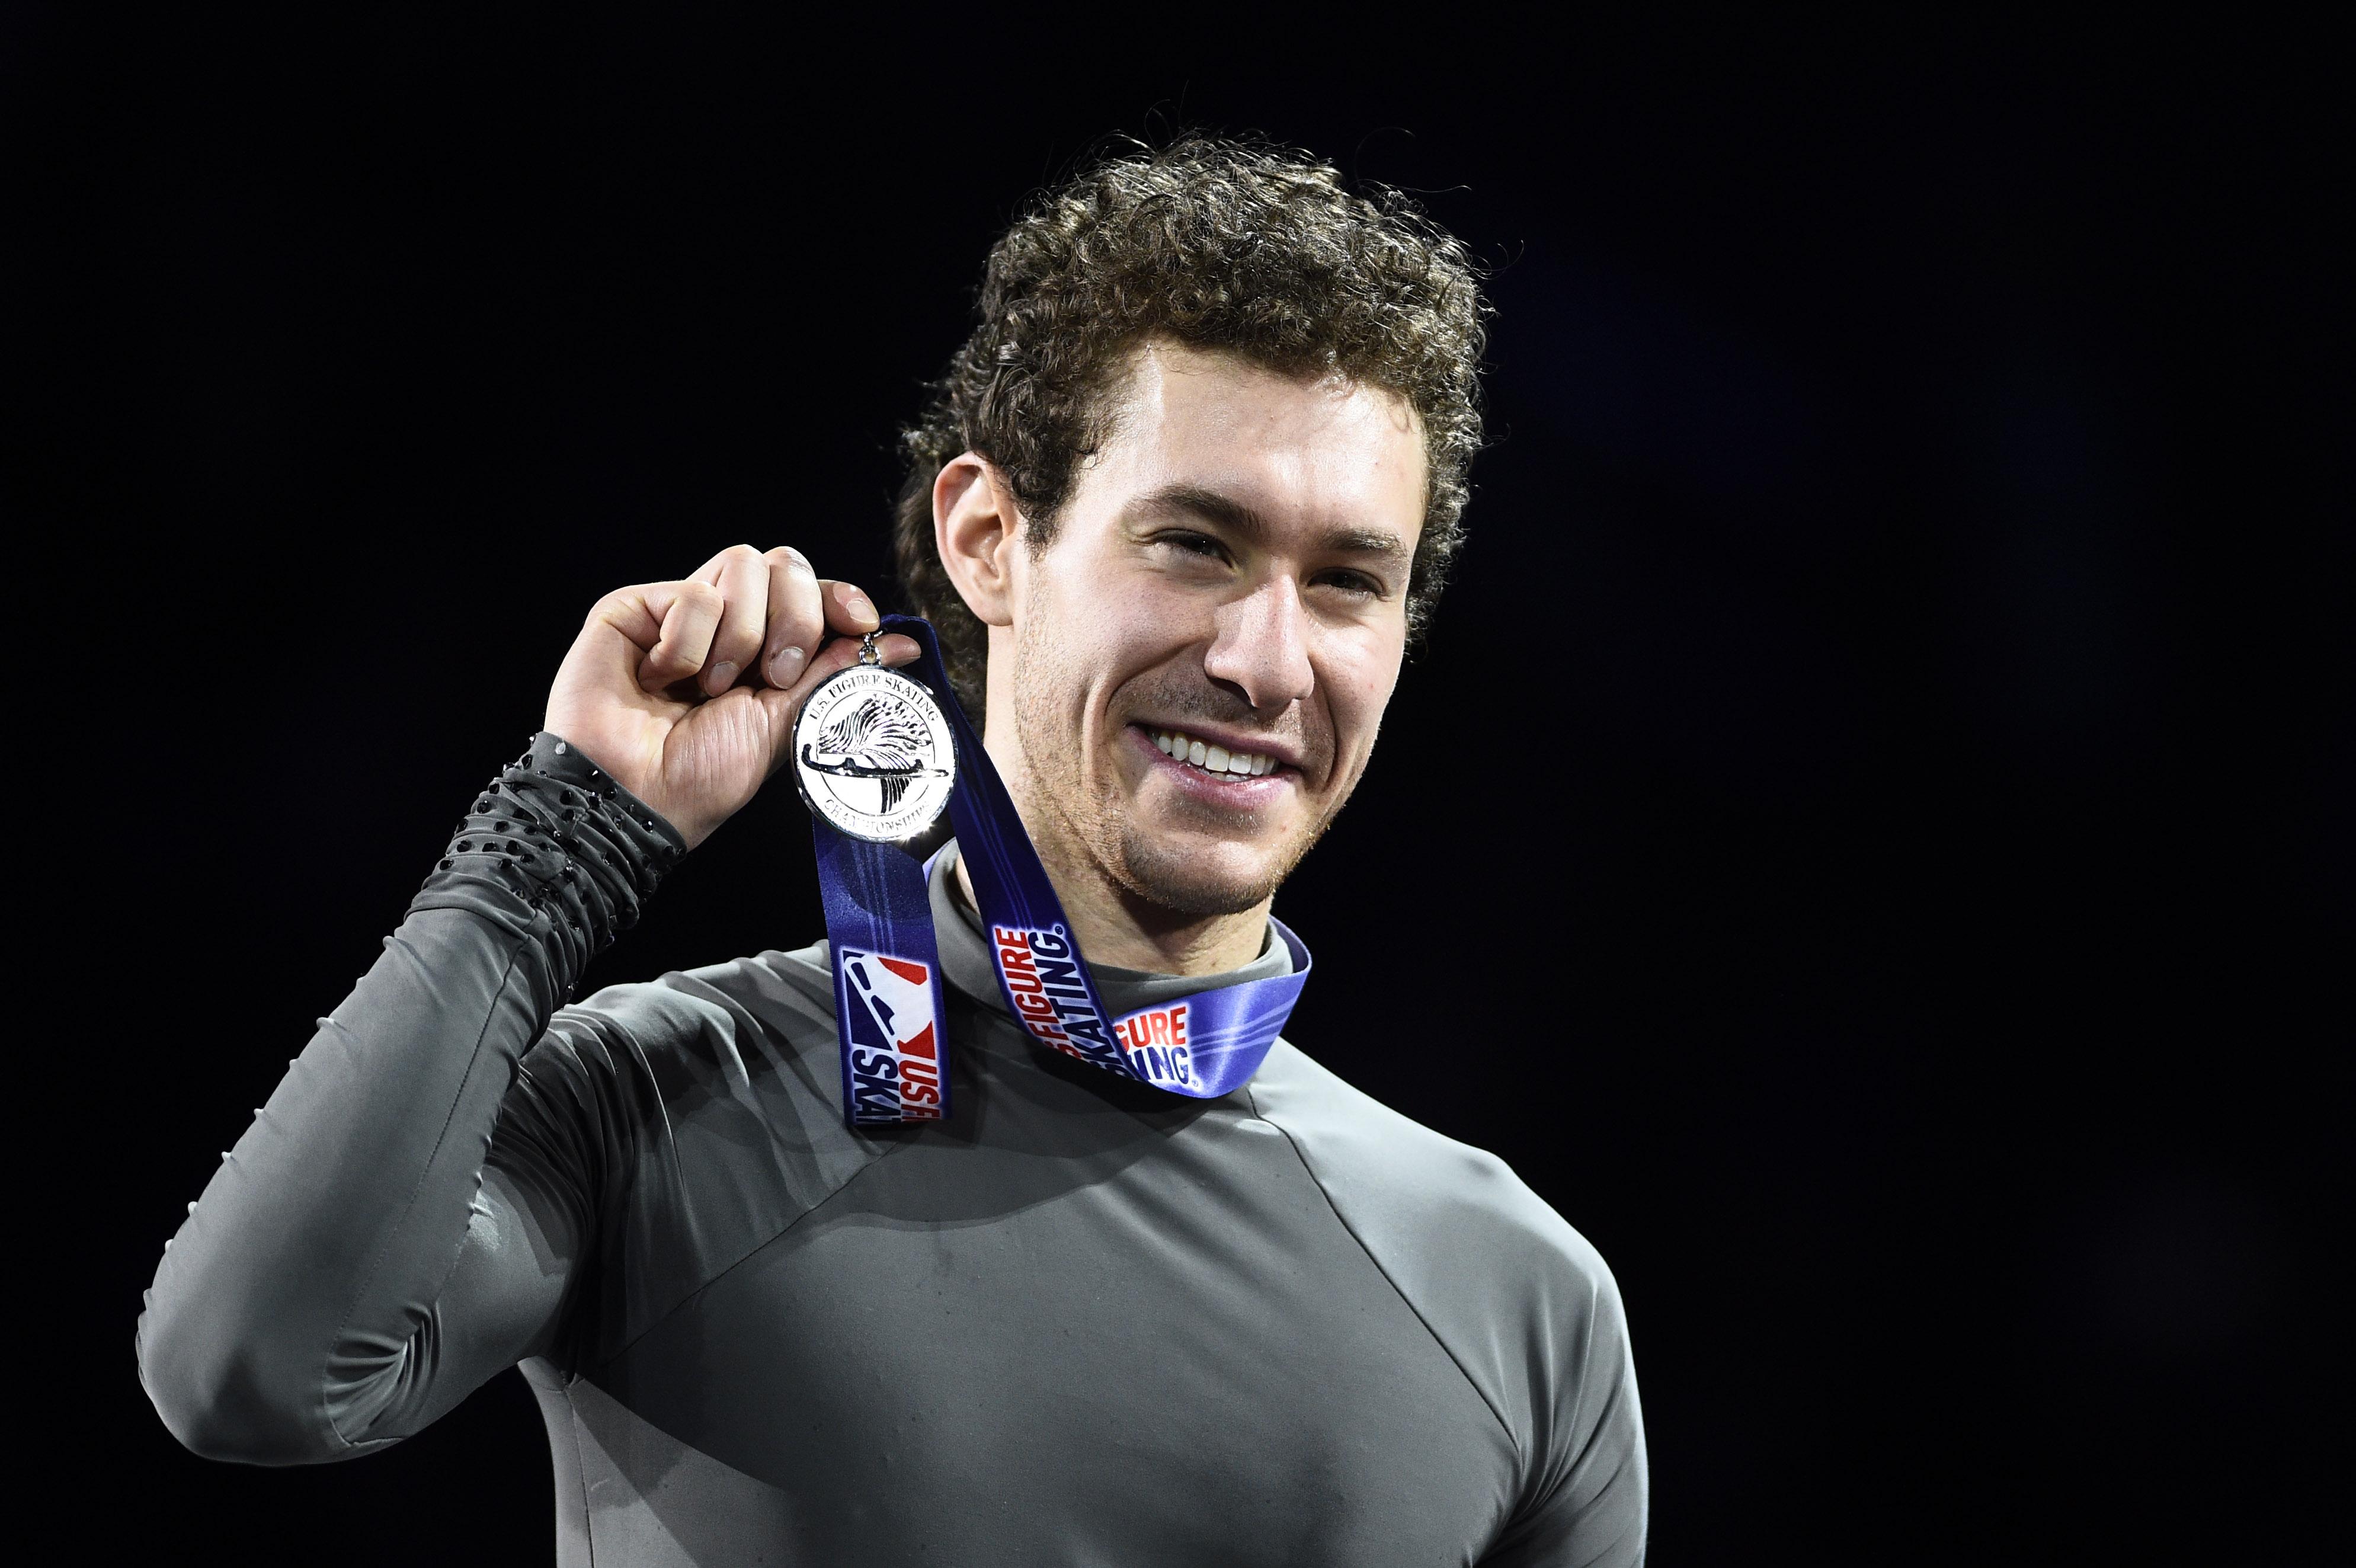 Jason Brown won the silver medal at the 2020 U.S. Nationals in North Carolina.